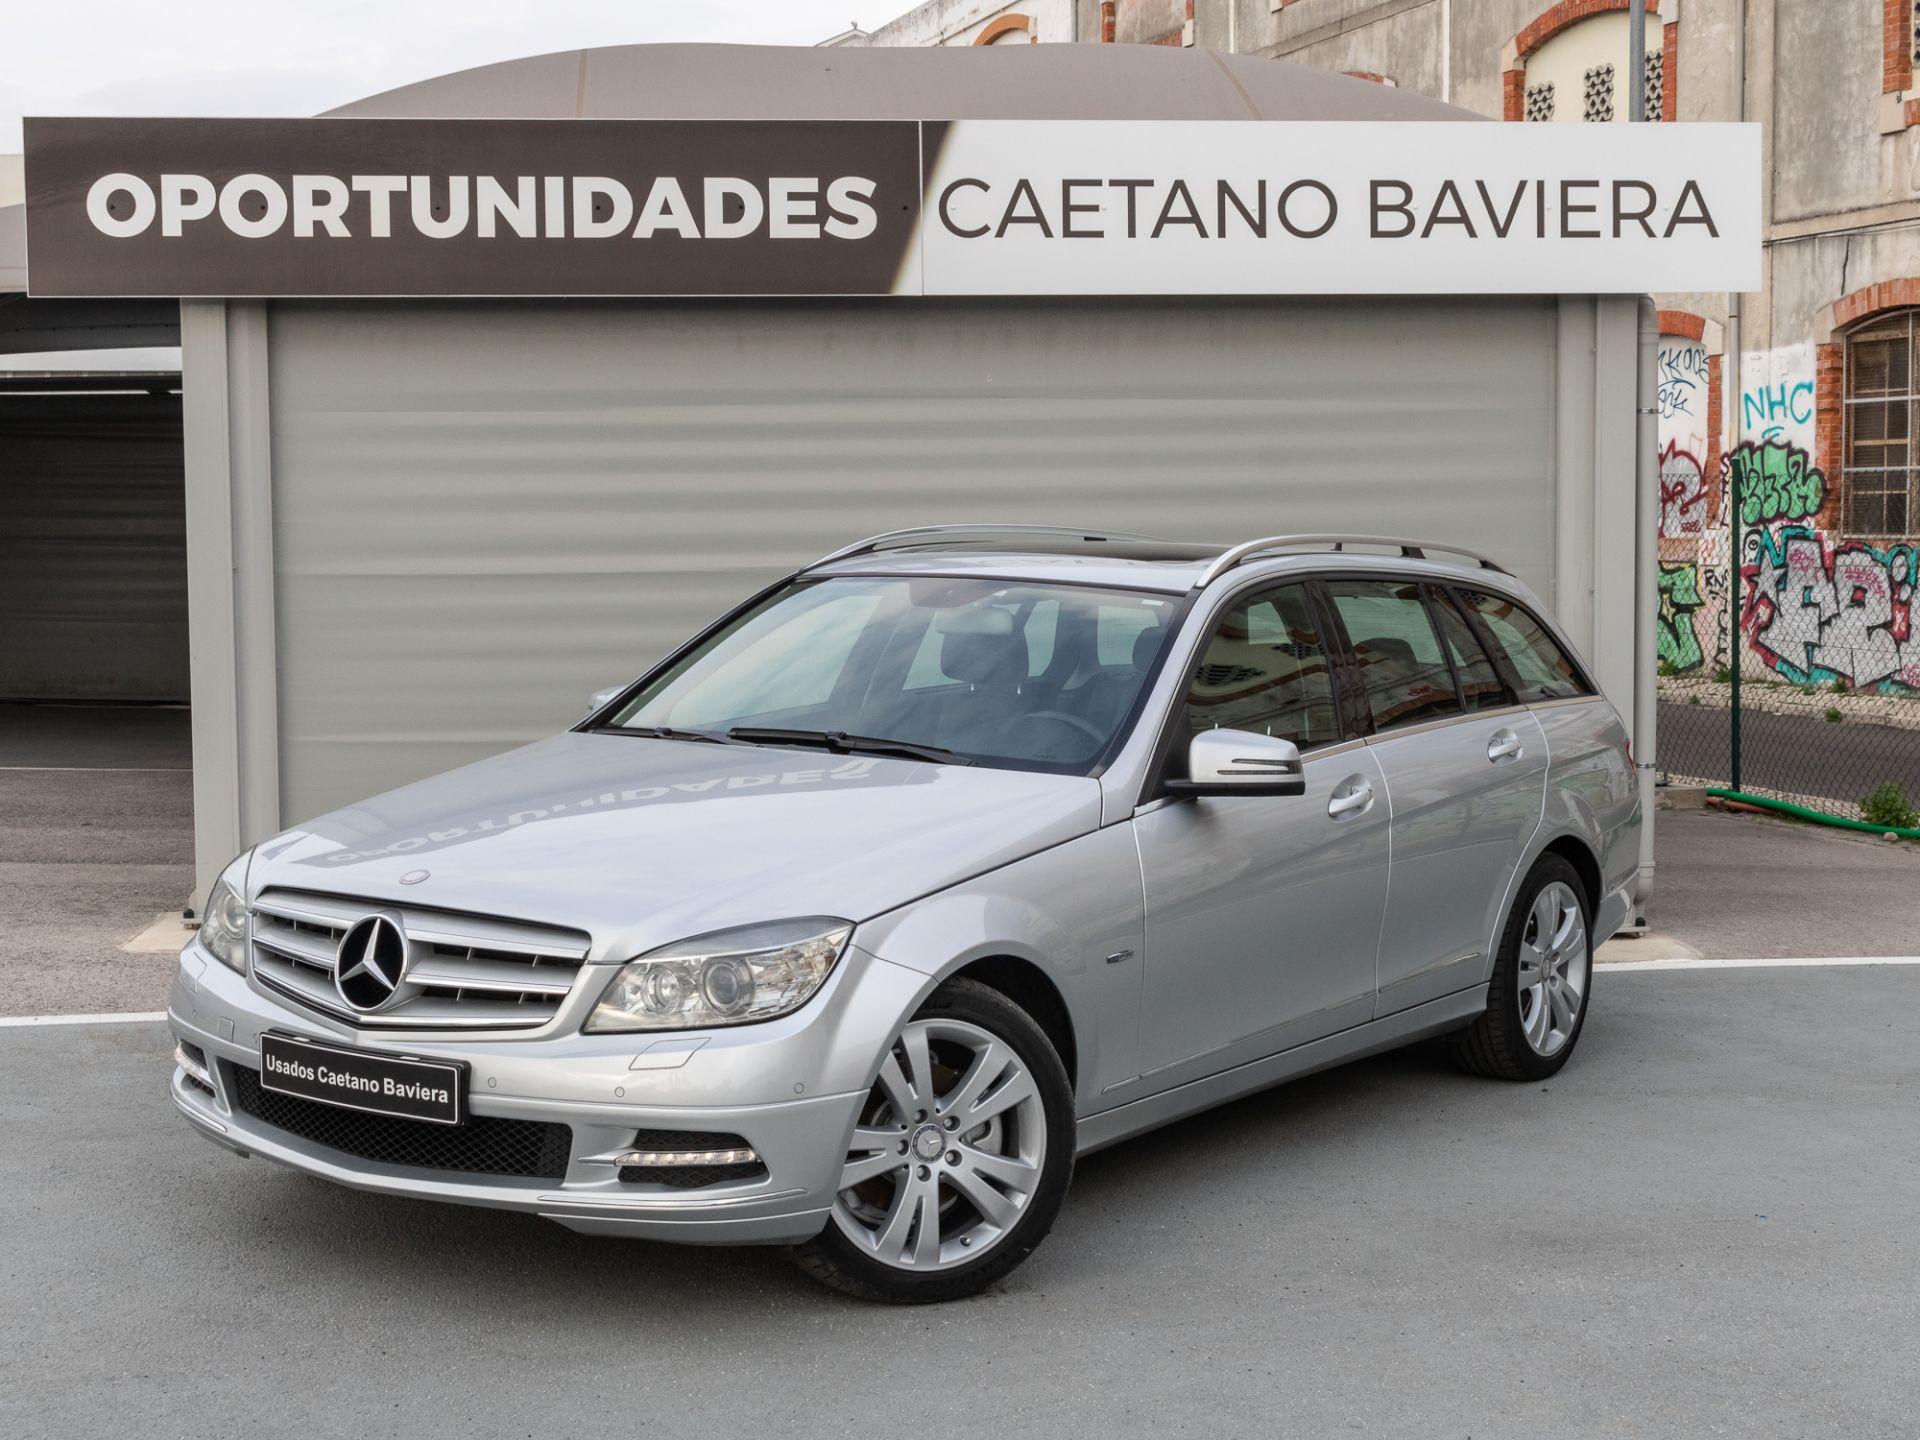 Mercedes Benz Classe C 220 CDI BlueEFFICIENCY CLASSIC segunda mão Lisboa